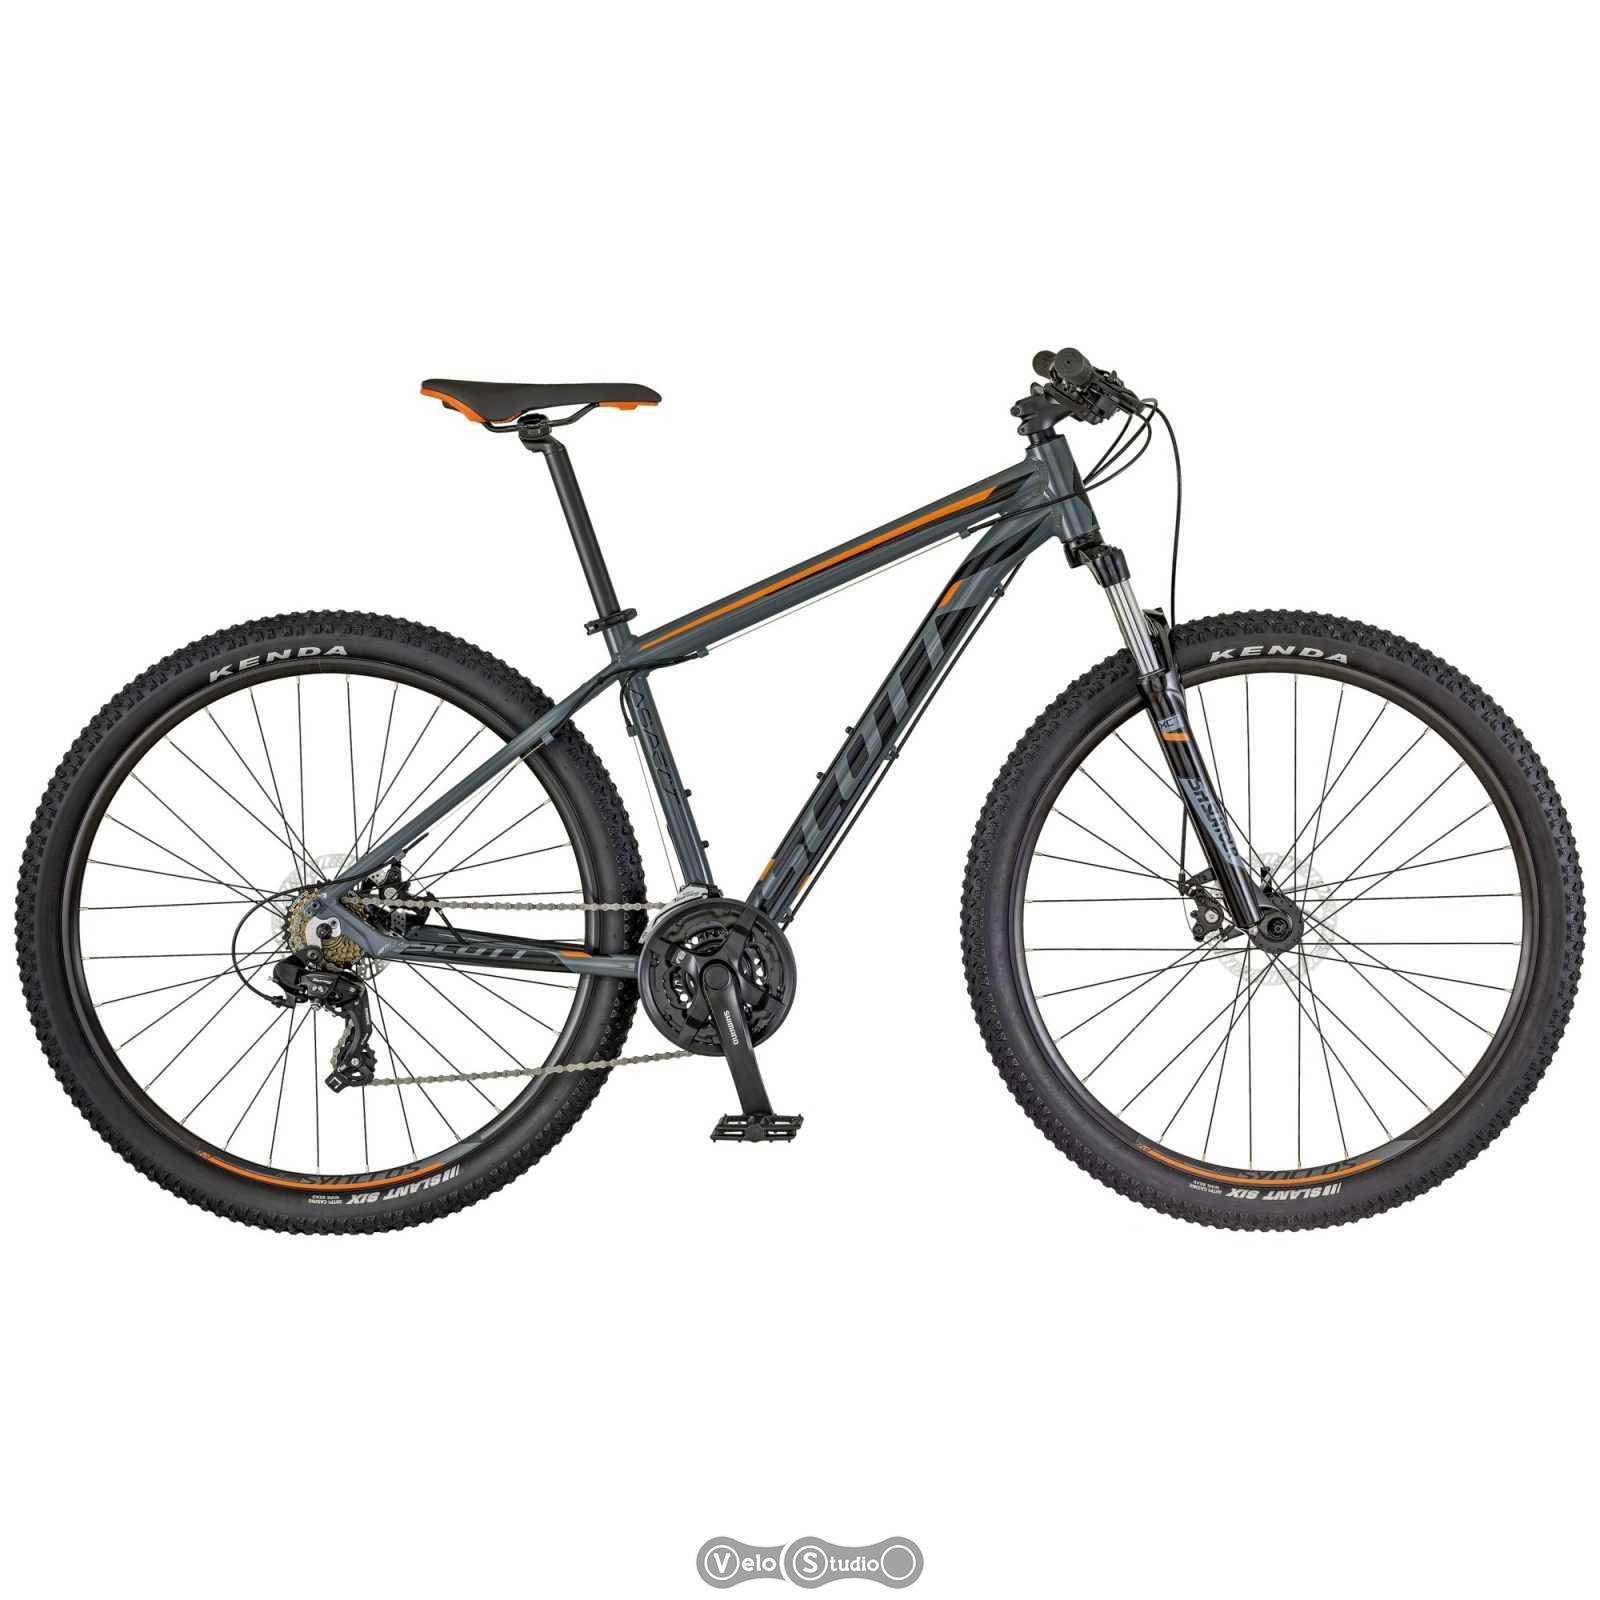 Scott Aspect 670 модель 2018 года 26 дюймов